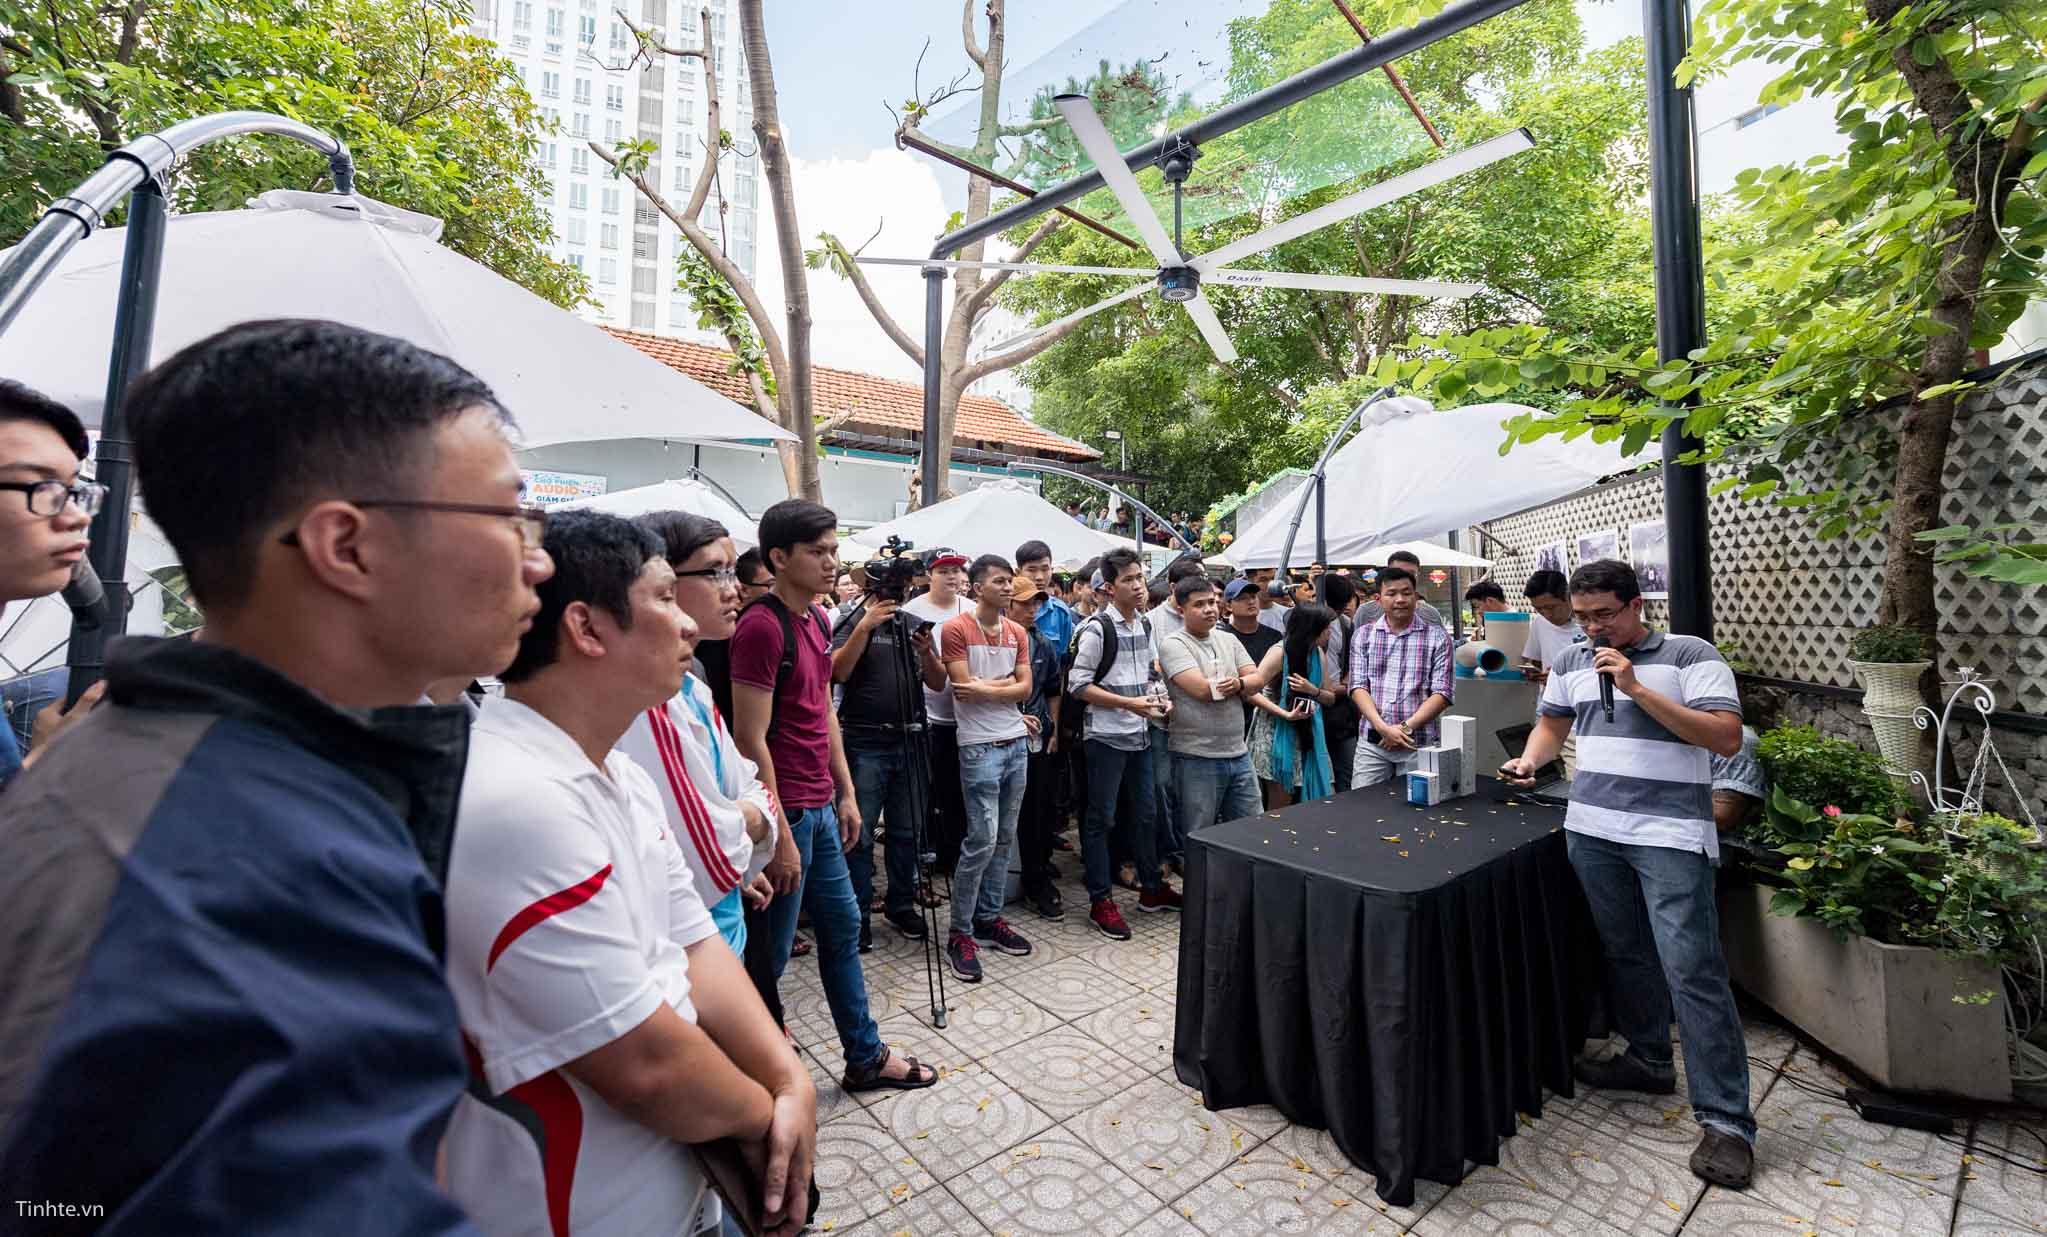 workshop-cong-nghe-loa-khong-day-tinhte-3.jpg